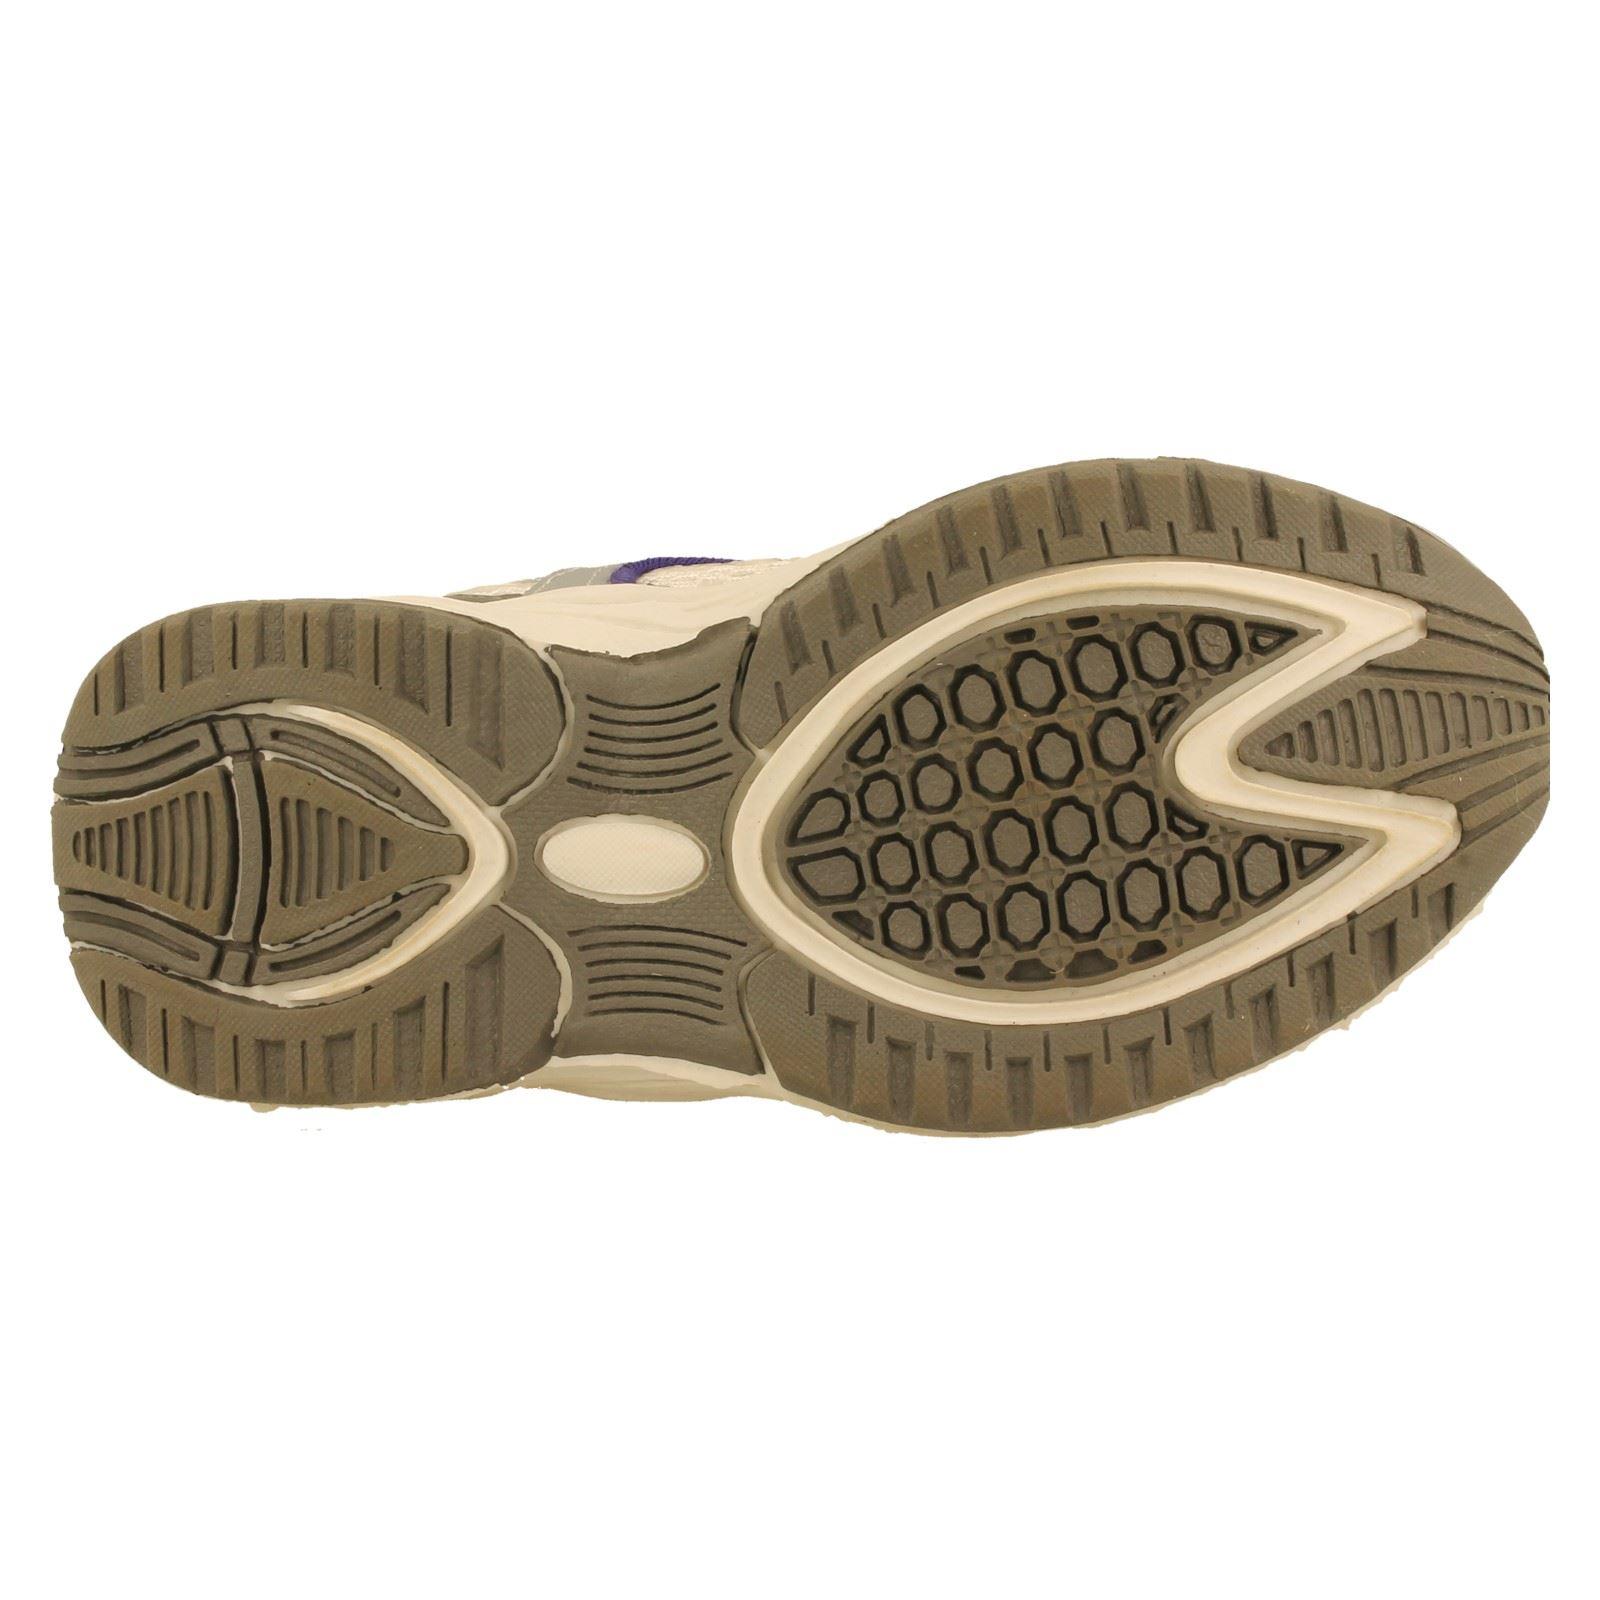 Chicas Hi-Tec Zapatillas Etiqueta R155 Jrg EZ-W